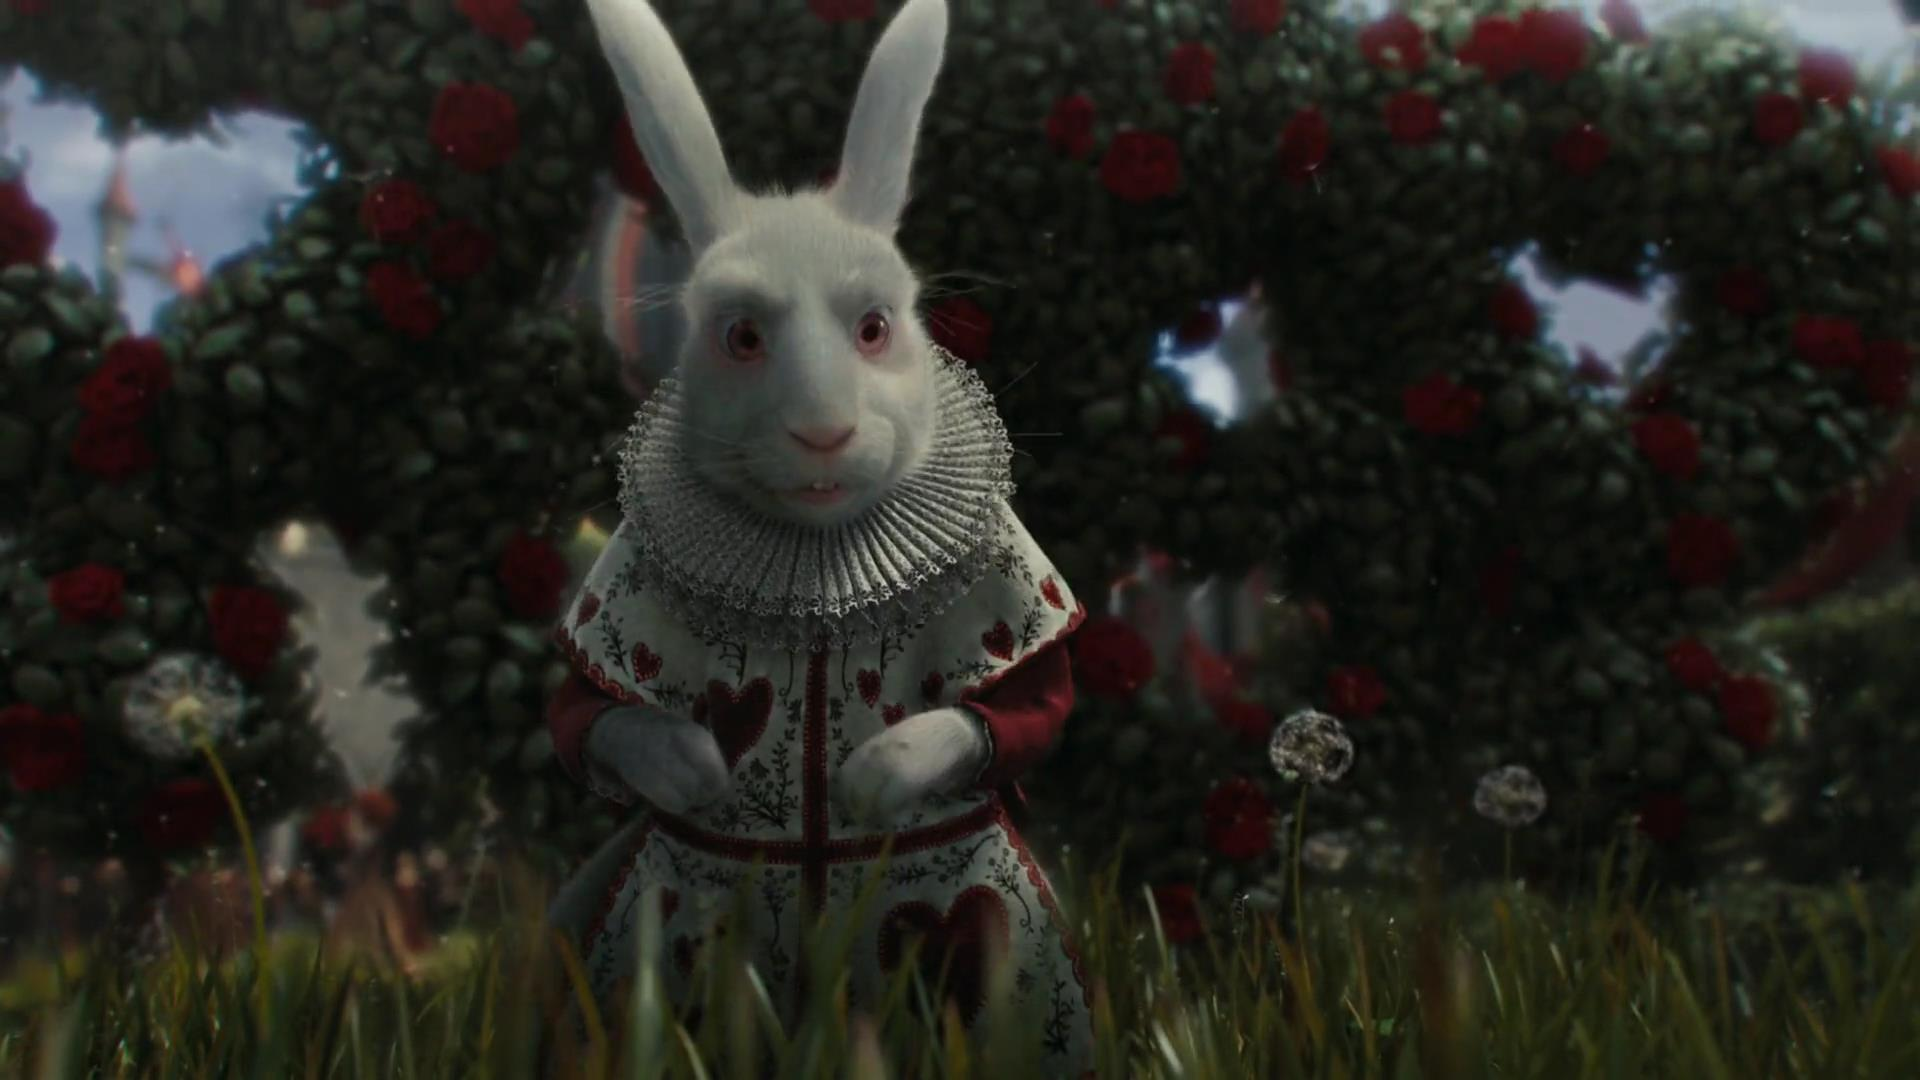 Заяц из алисы в стране чудес фото